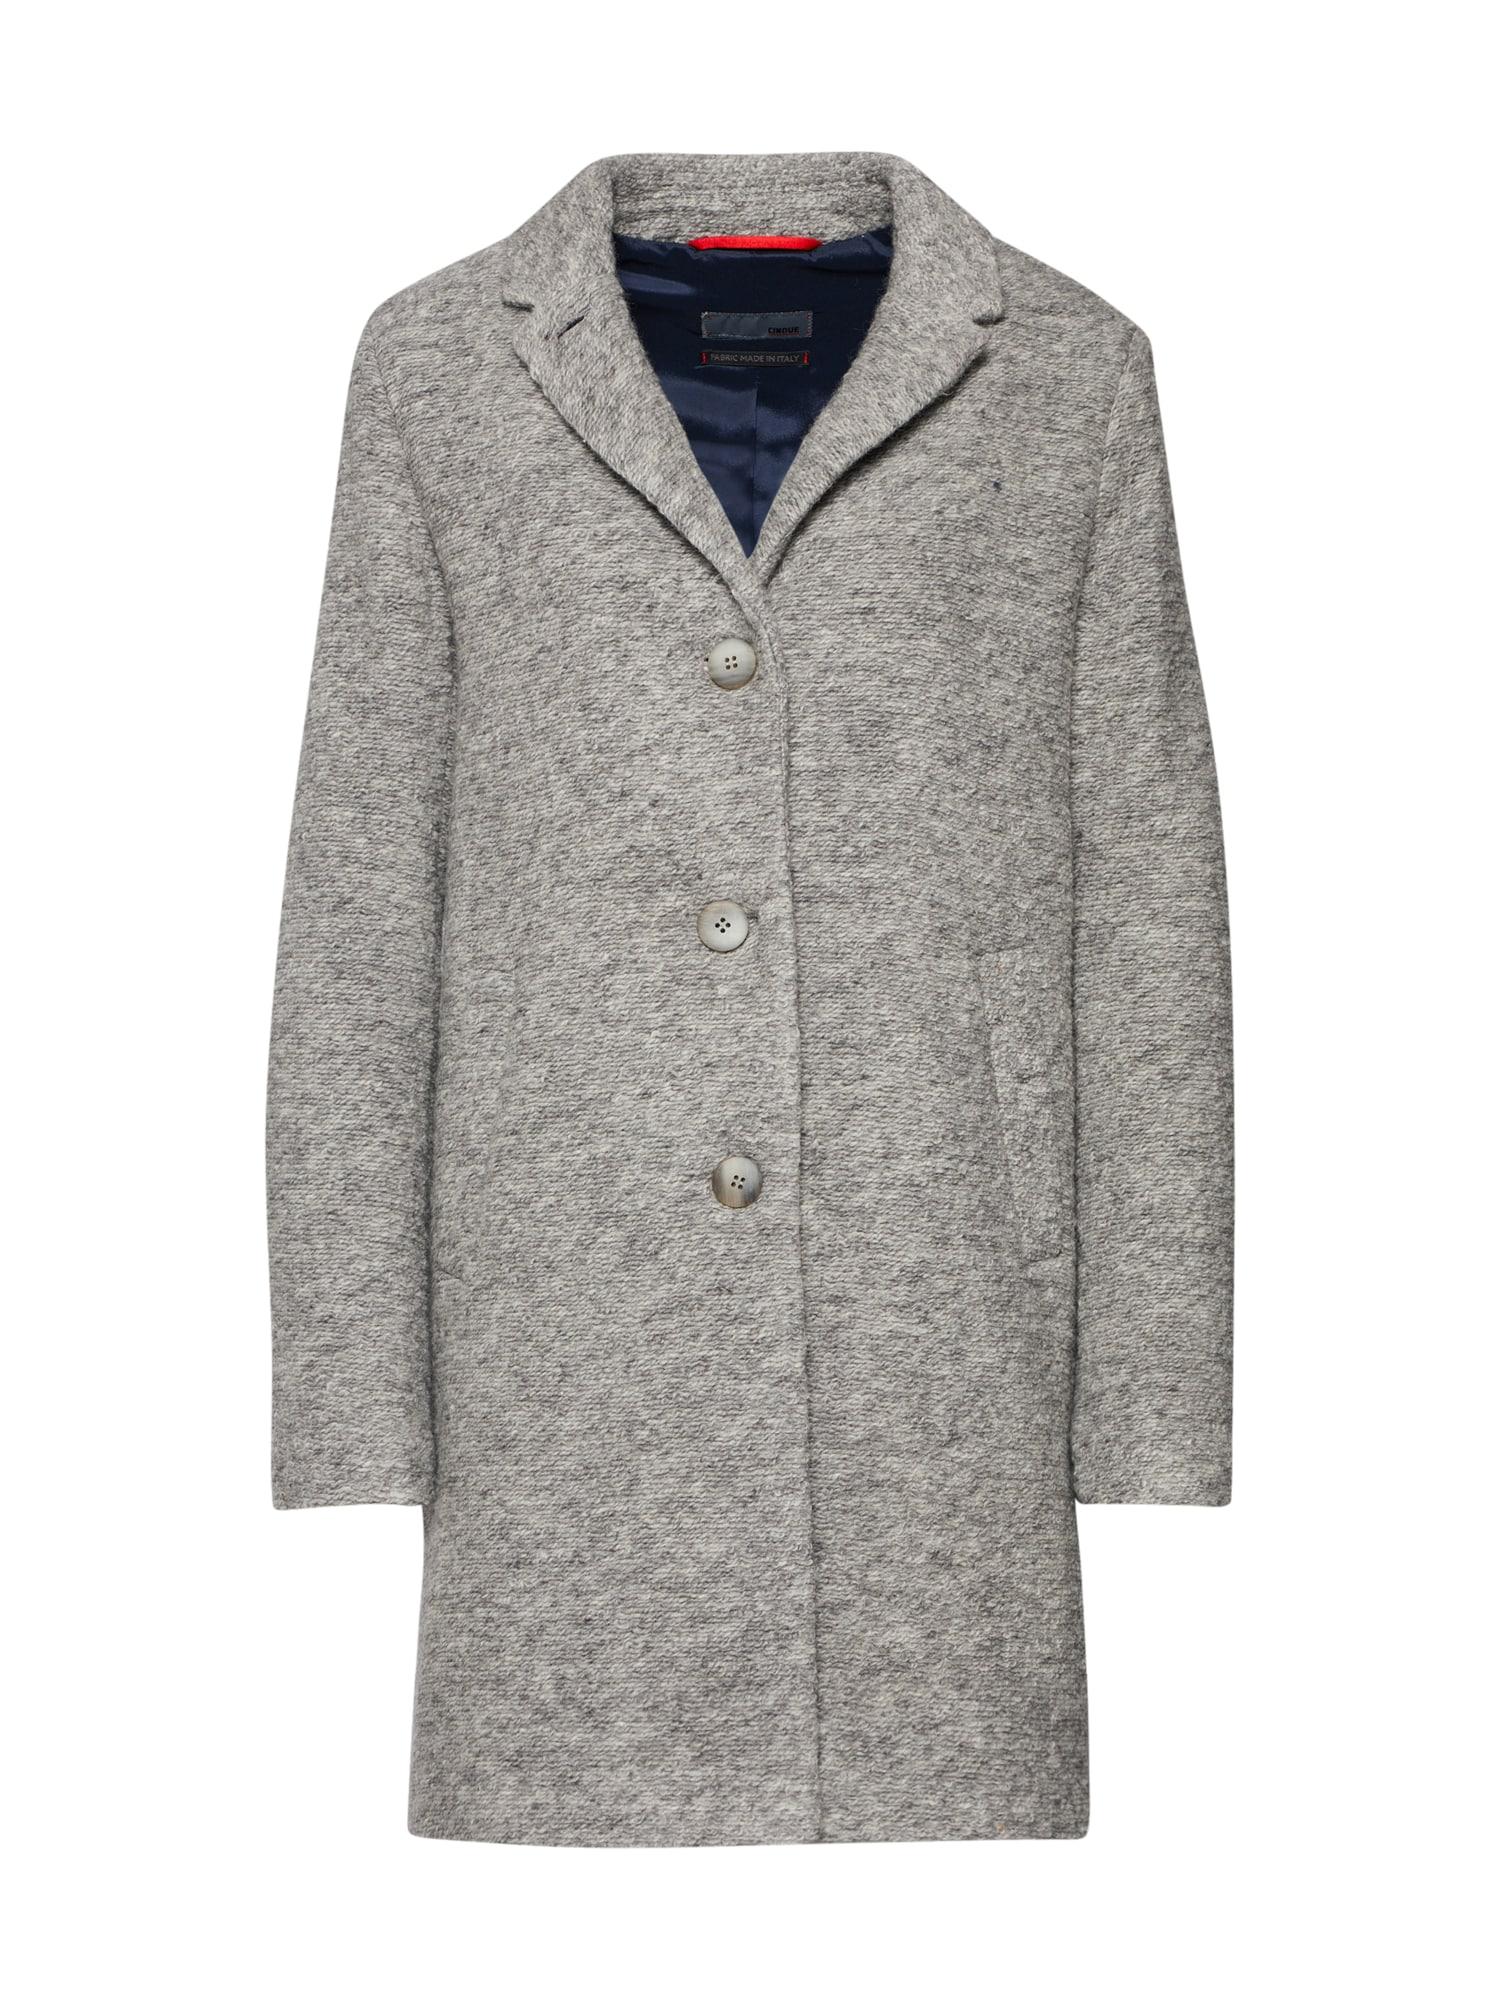 Přechodný kabát CIMIRACLE šedý melír CINQUE